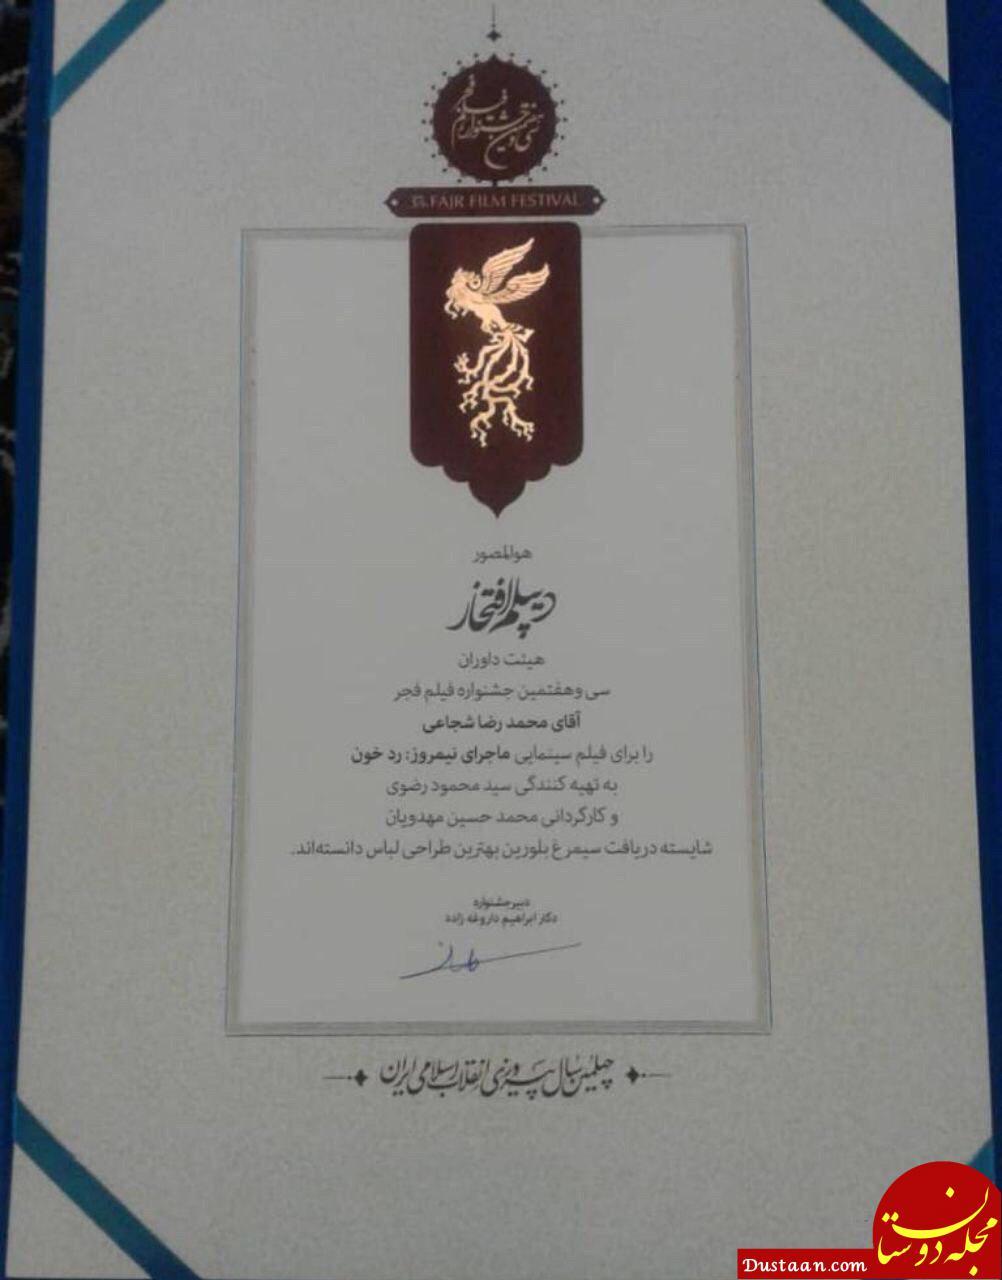 www.dustaan.com یکی از سیمرغ های نرگس آبیار پس گرفته شد